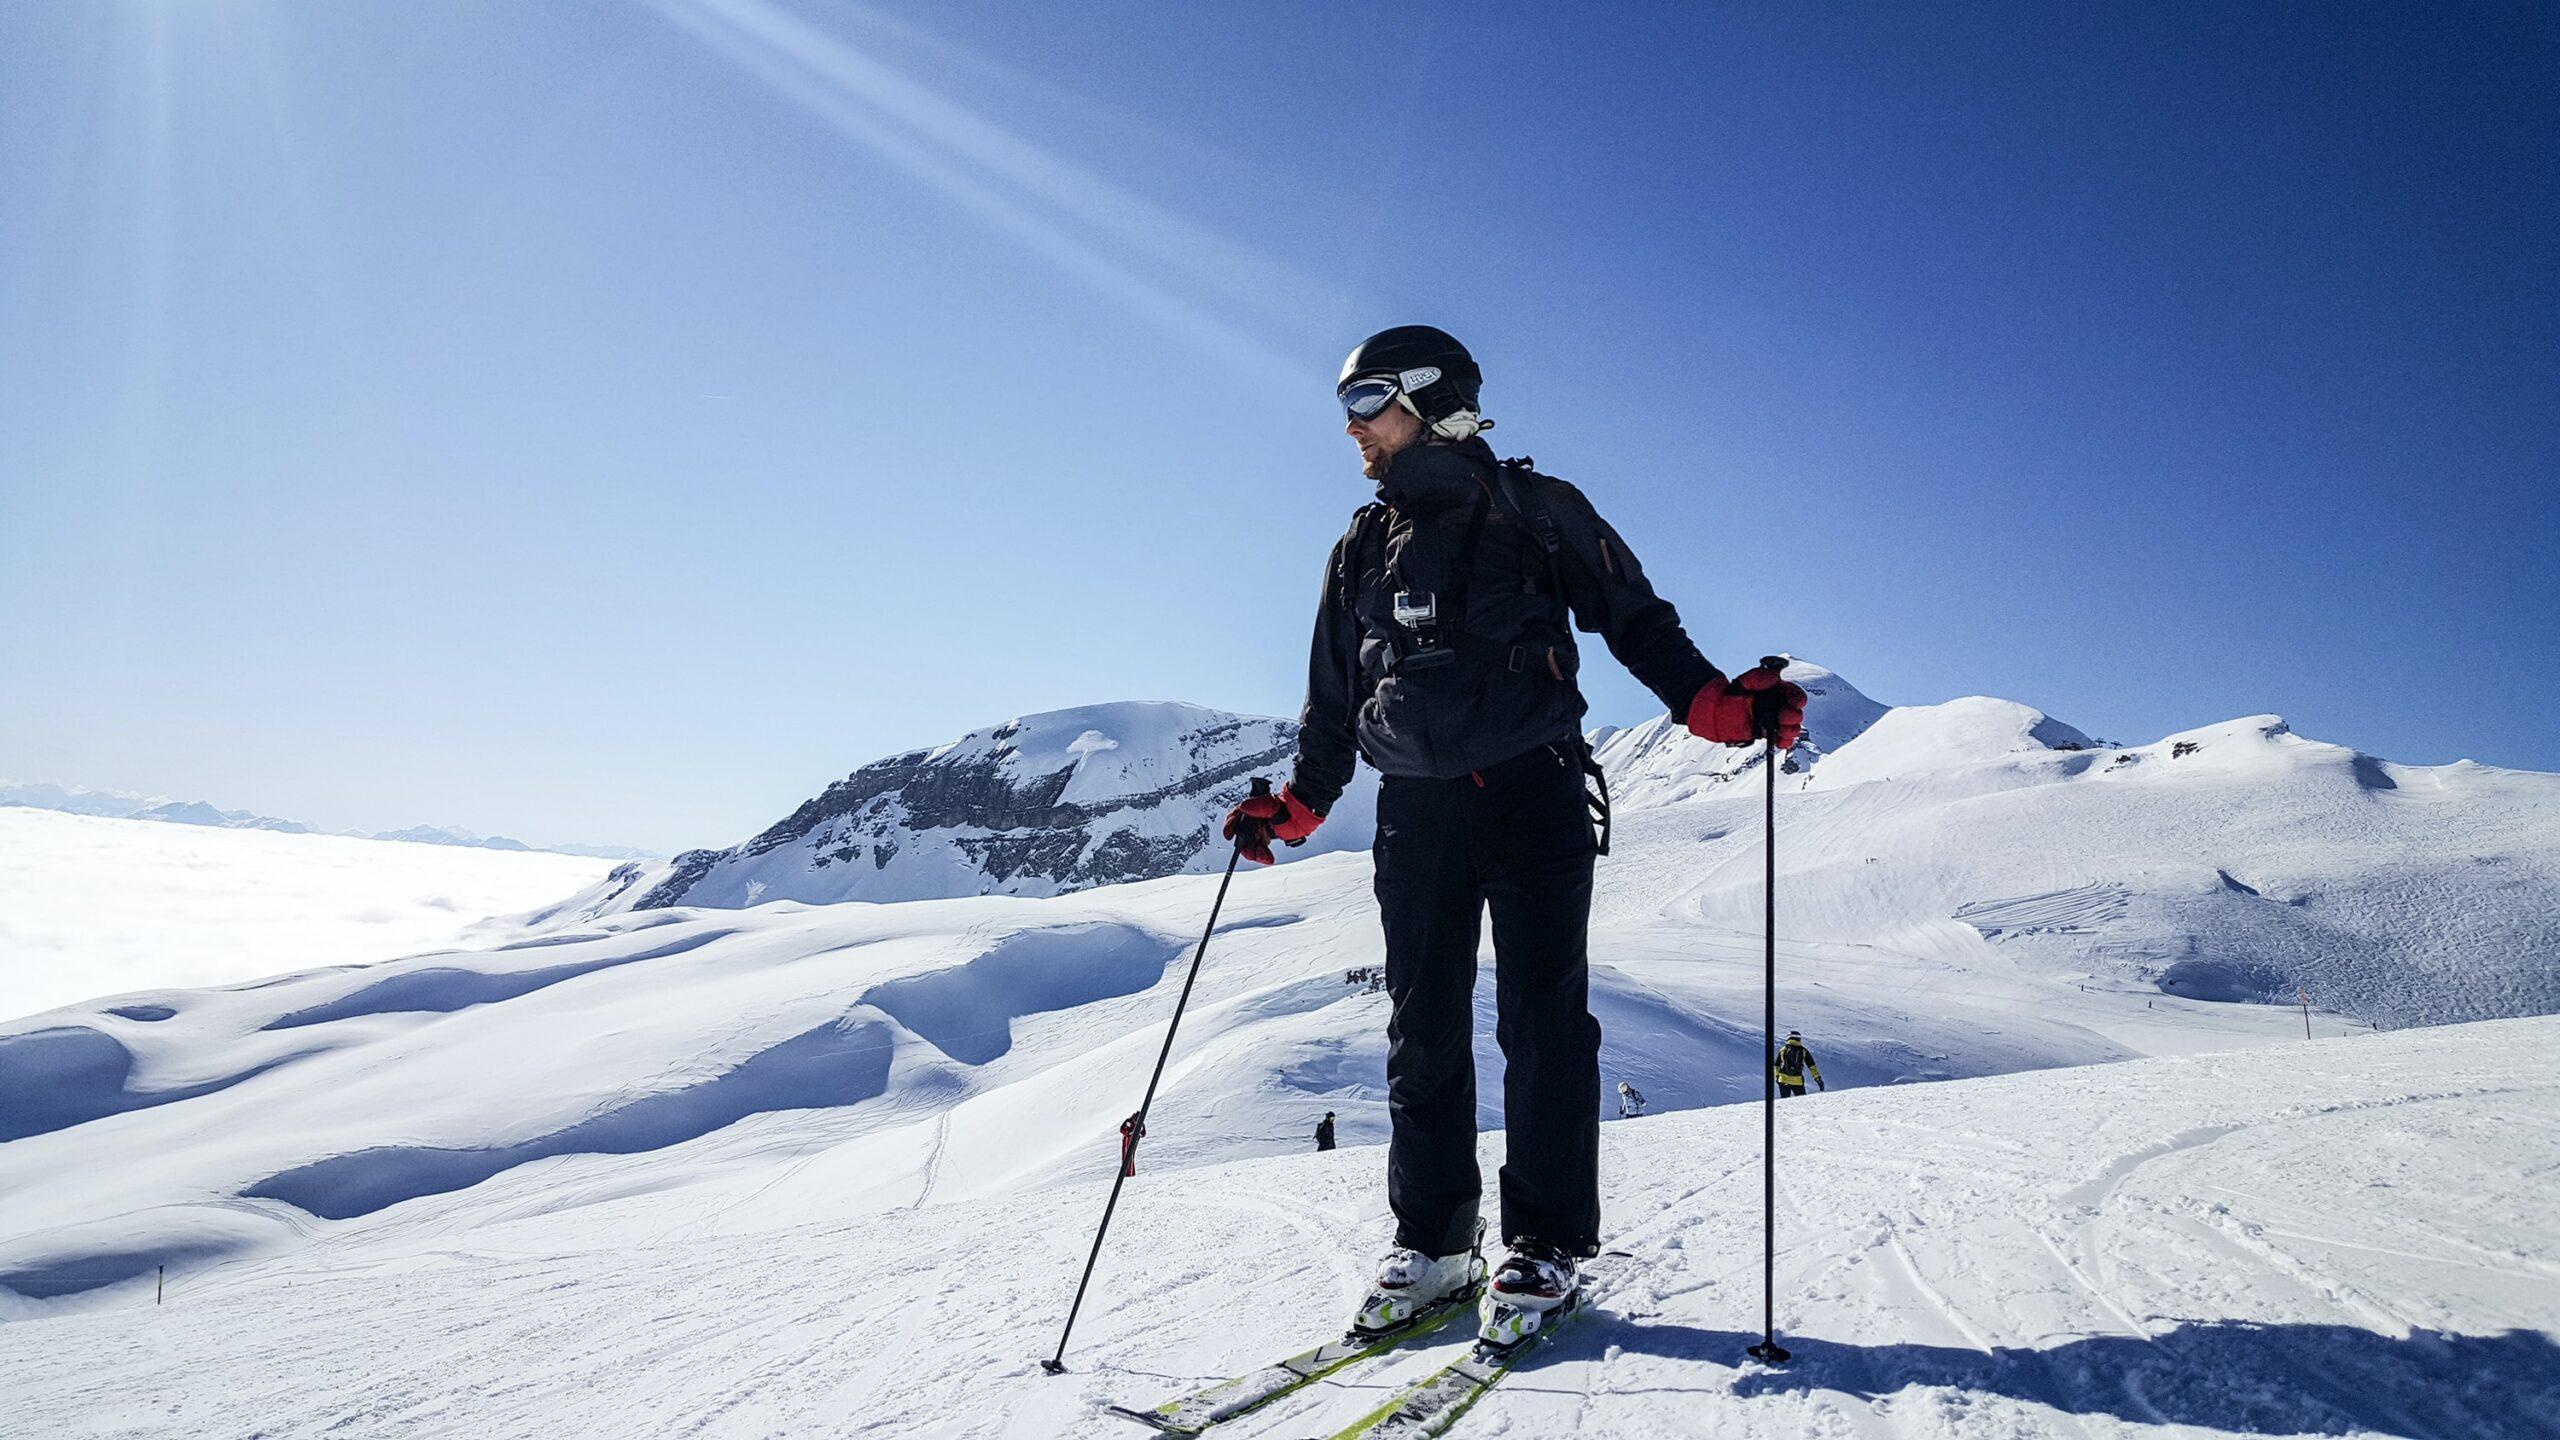 man in spring skiing gloves